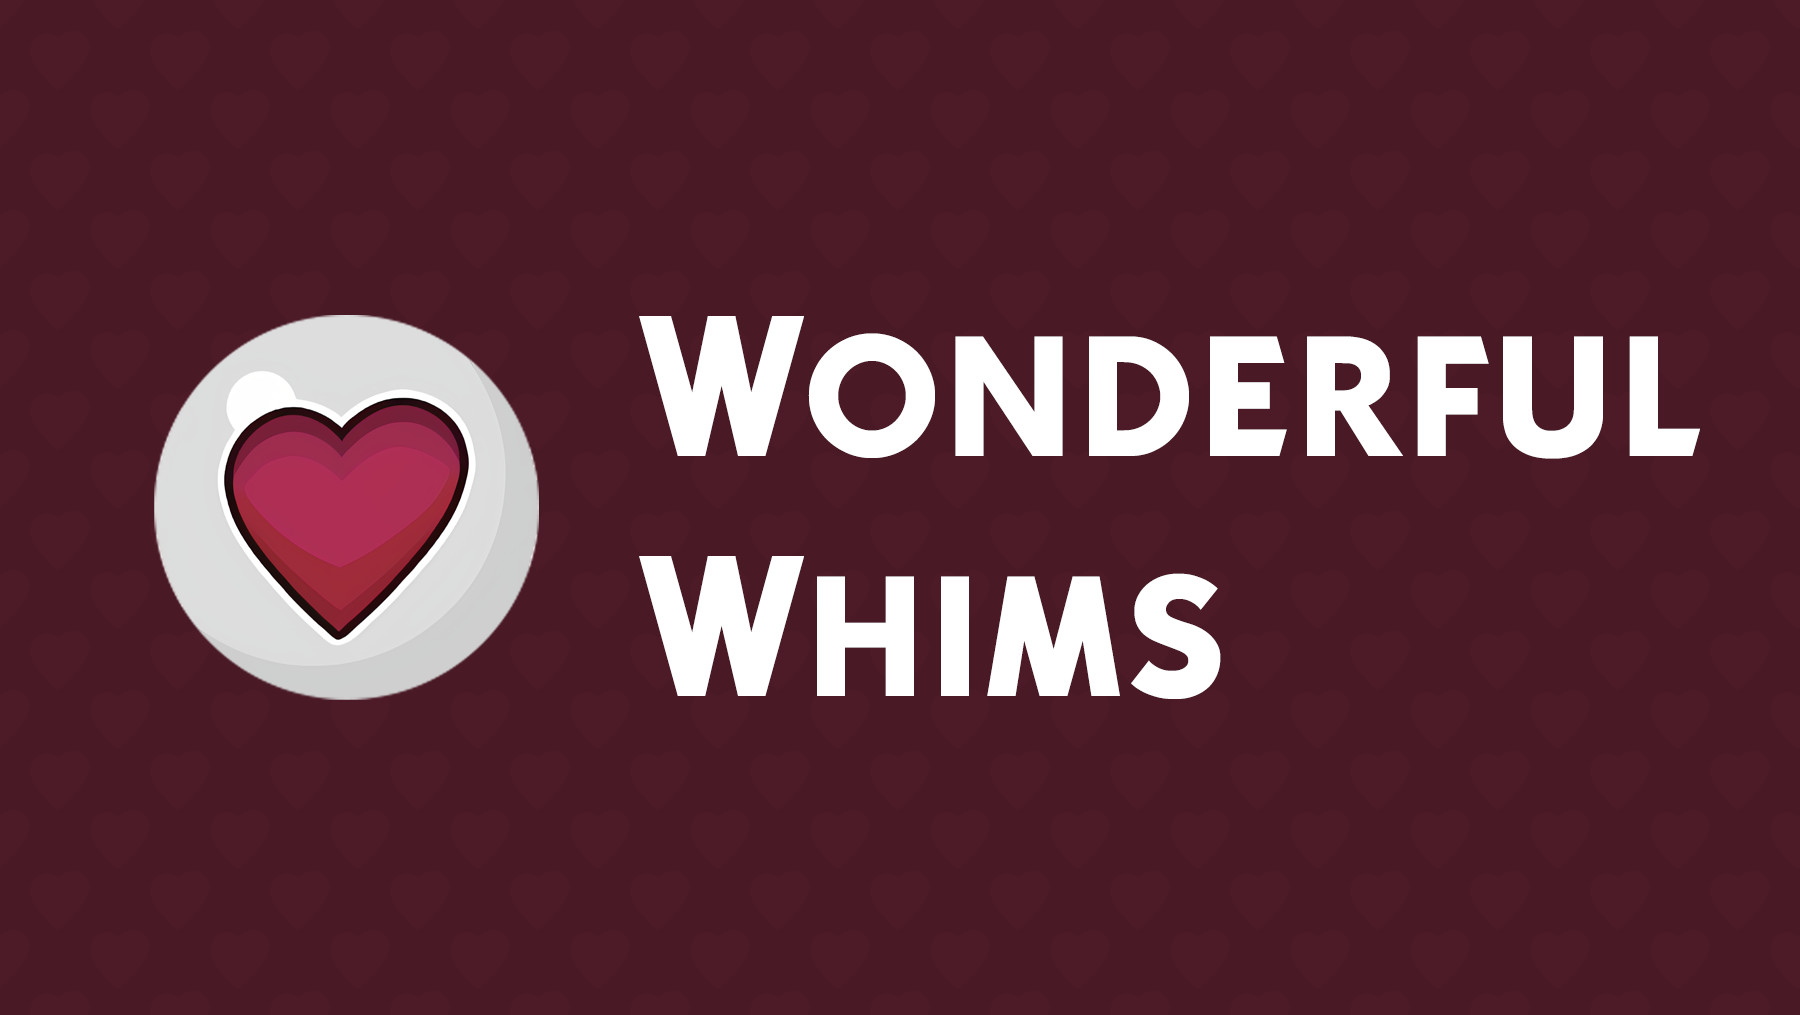 ModTheSims - WonderfulWhims